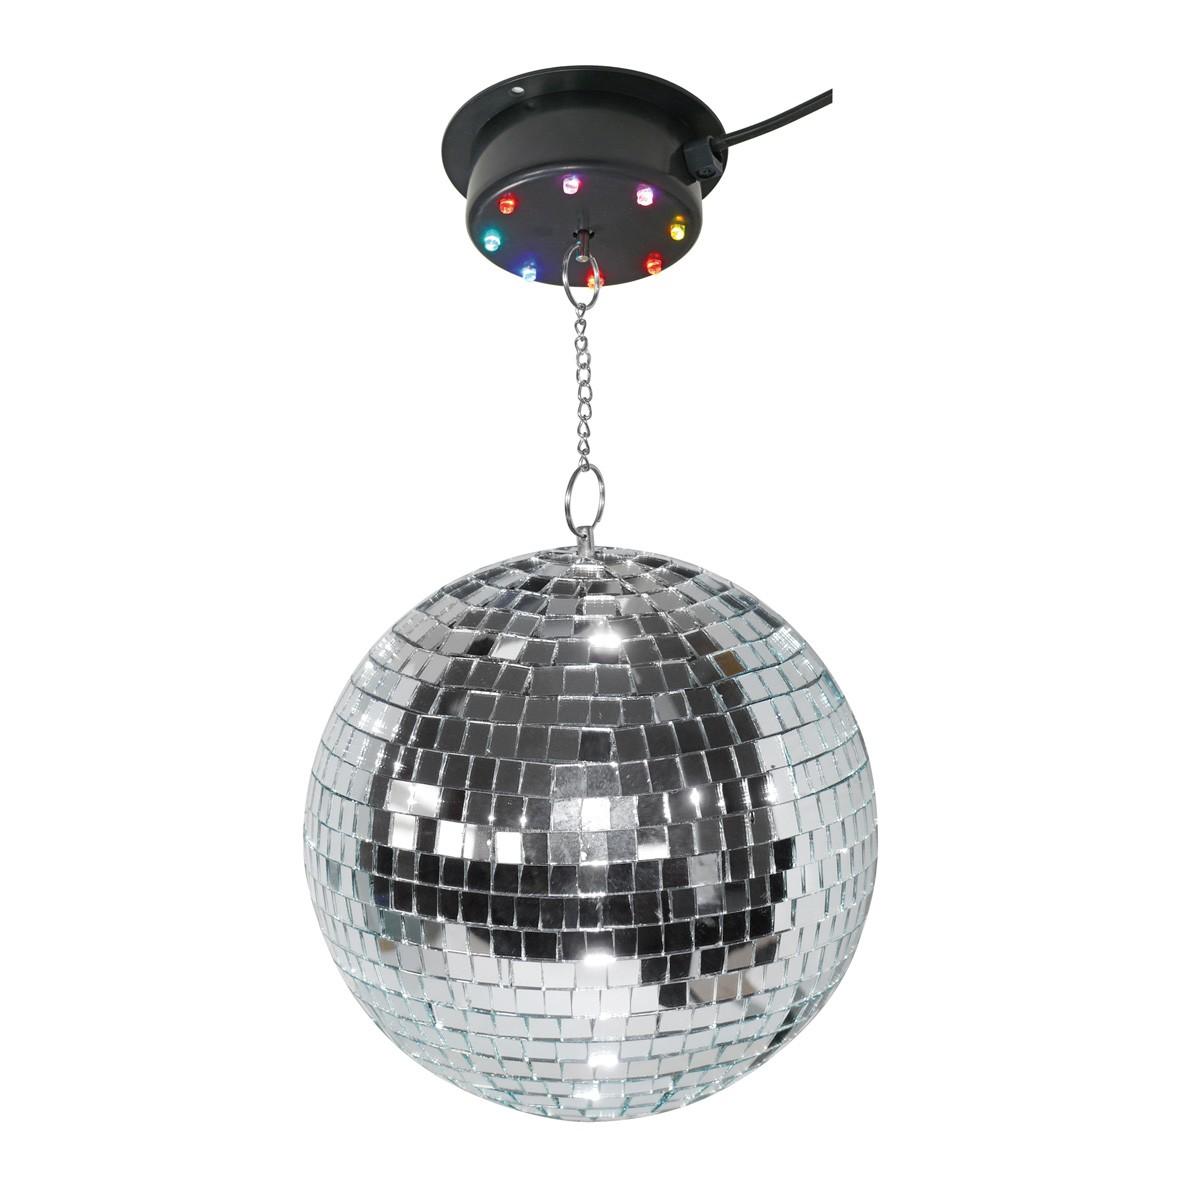 Spiegelkugel Komplettset 20cm mit LED Motor / Farbwechsler - PARTY KIT 20